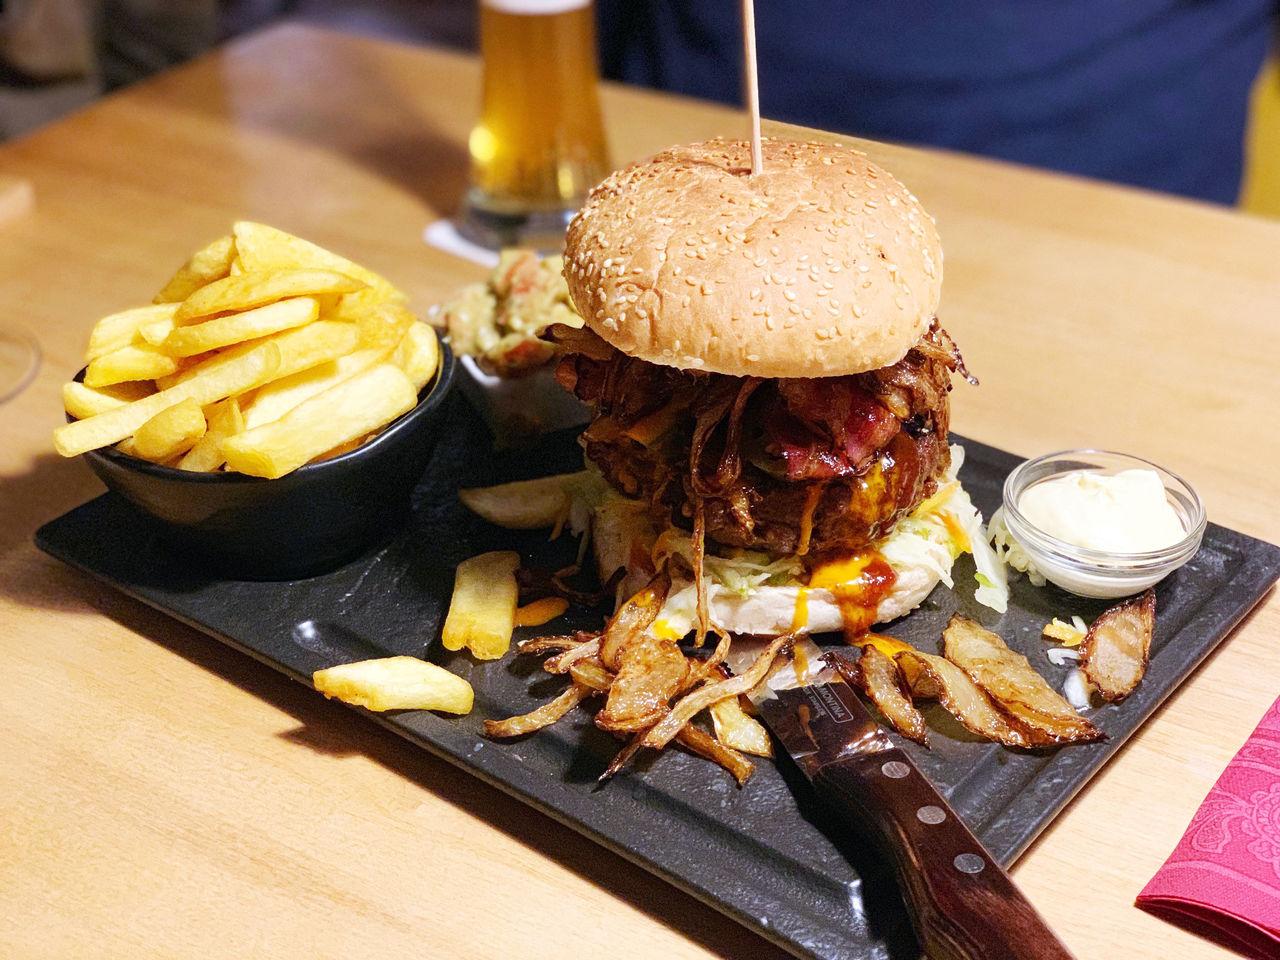 Chili-Cheese Burger mit BBQ-Sauce, Röstzwiebeln, Gewürzgurke, Tomate, Coleslawsalat, Jalapenos, Käse & Steakhouse Fries